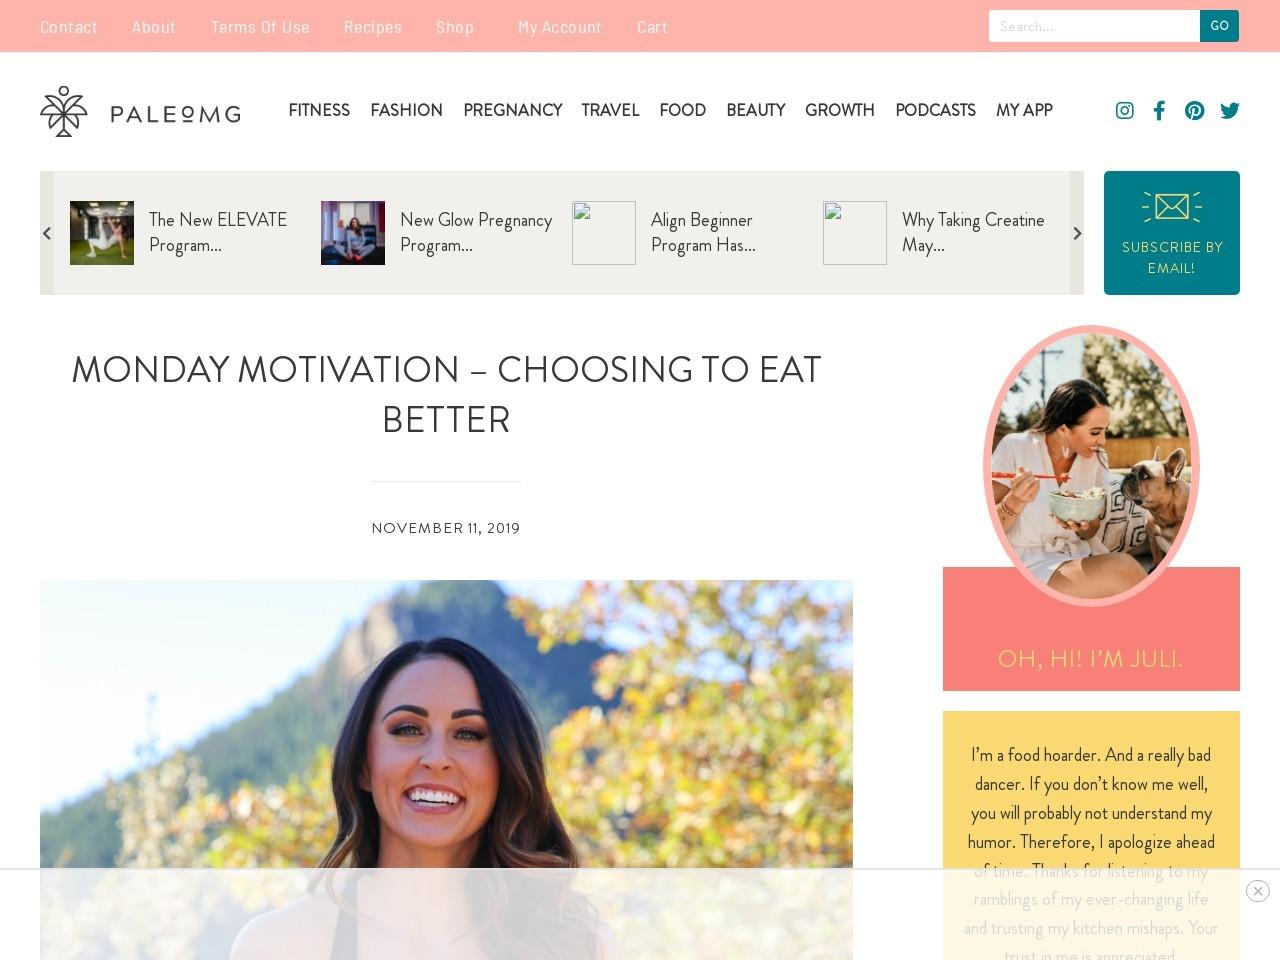 Monday Motivation – Choosing to Eat Better